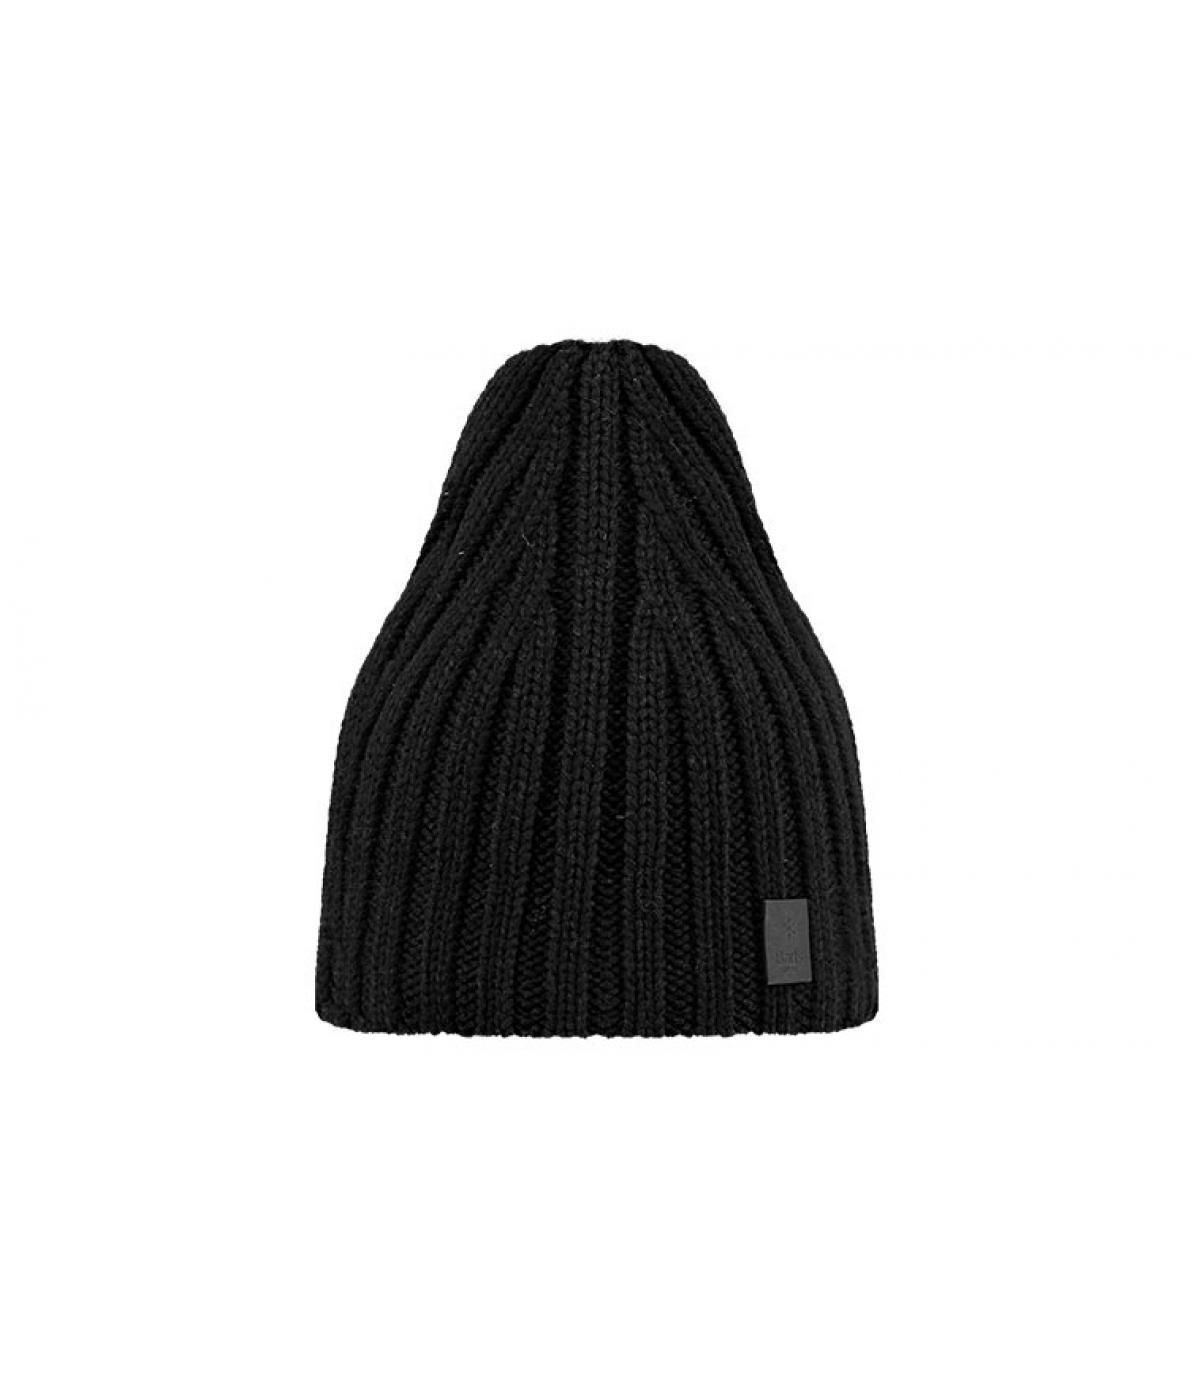 Black oversize men beanie - Milford beanie black by Barts. Headict 46913bf8670